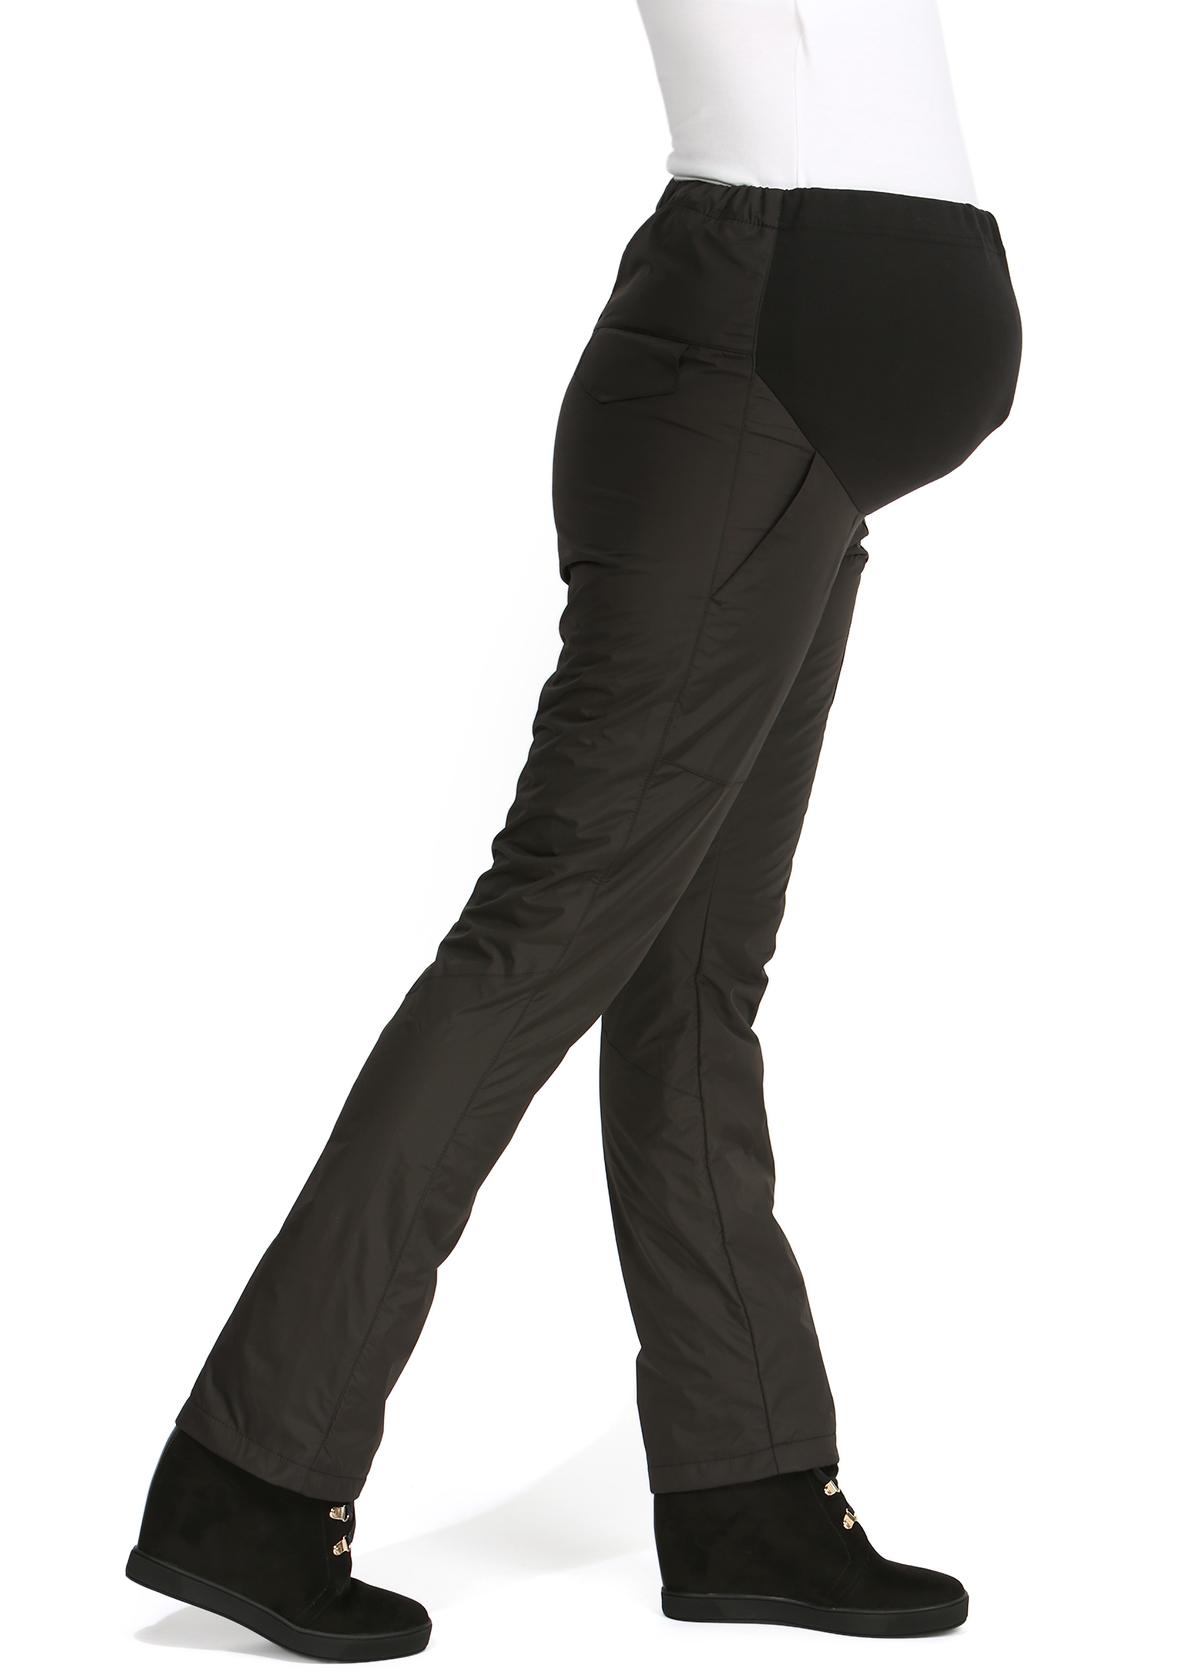 MamaMia.by, брюки, джинсы для беременных купить в Минске, в Беларуси, ... a29ecfbd5fb